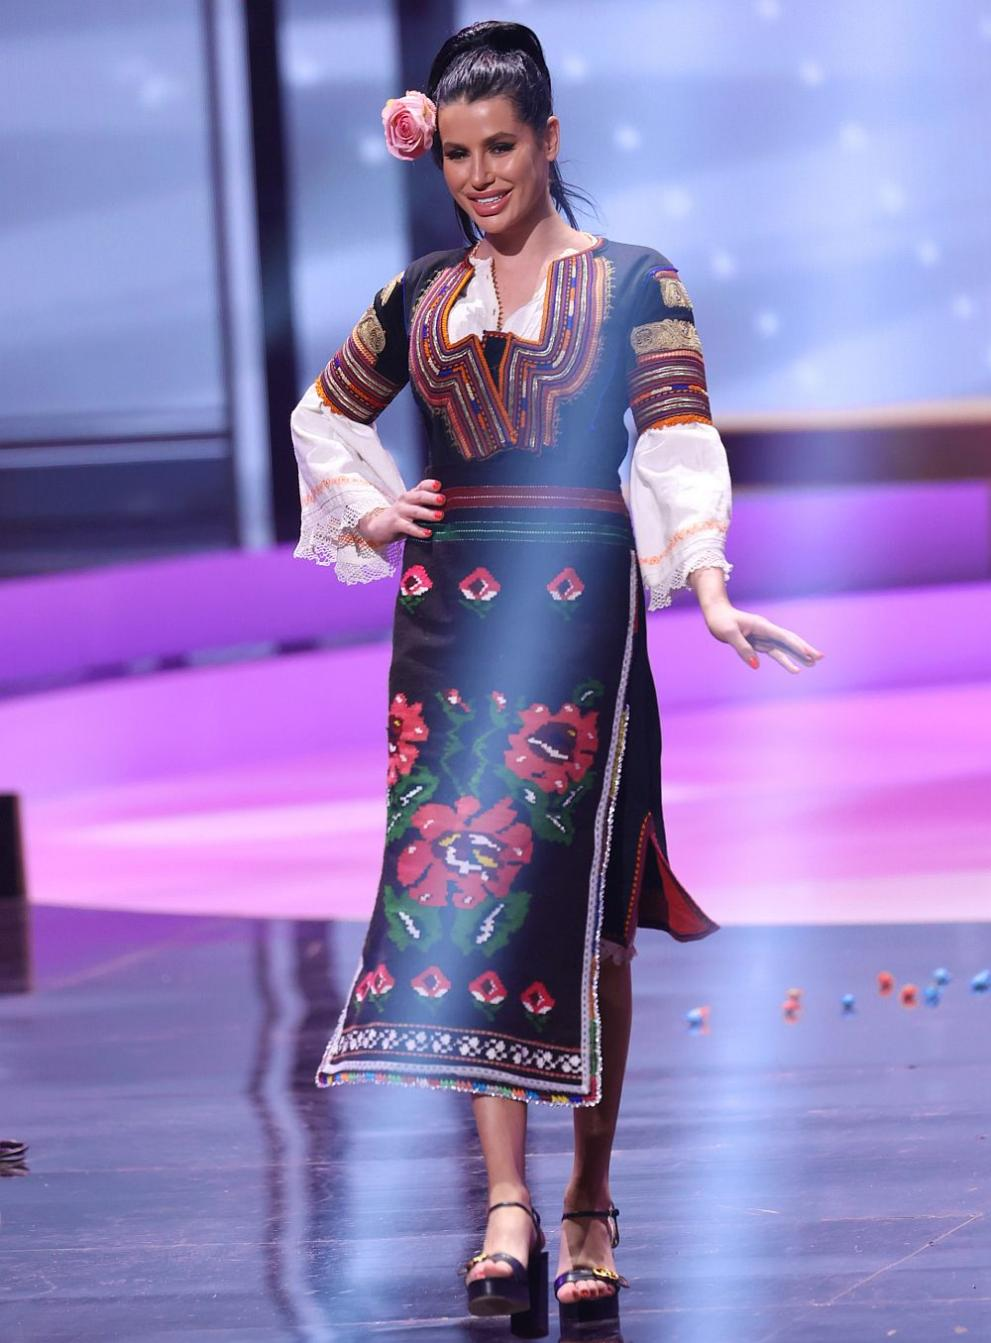 Мис България Радинела Чушева на конкурса Мис Вселена